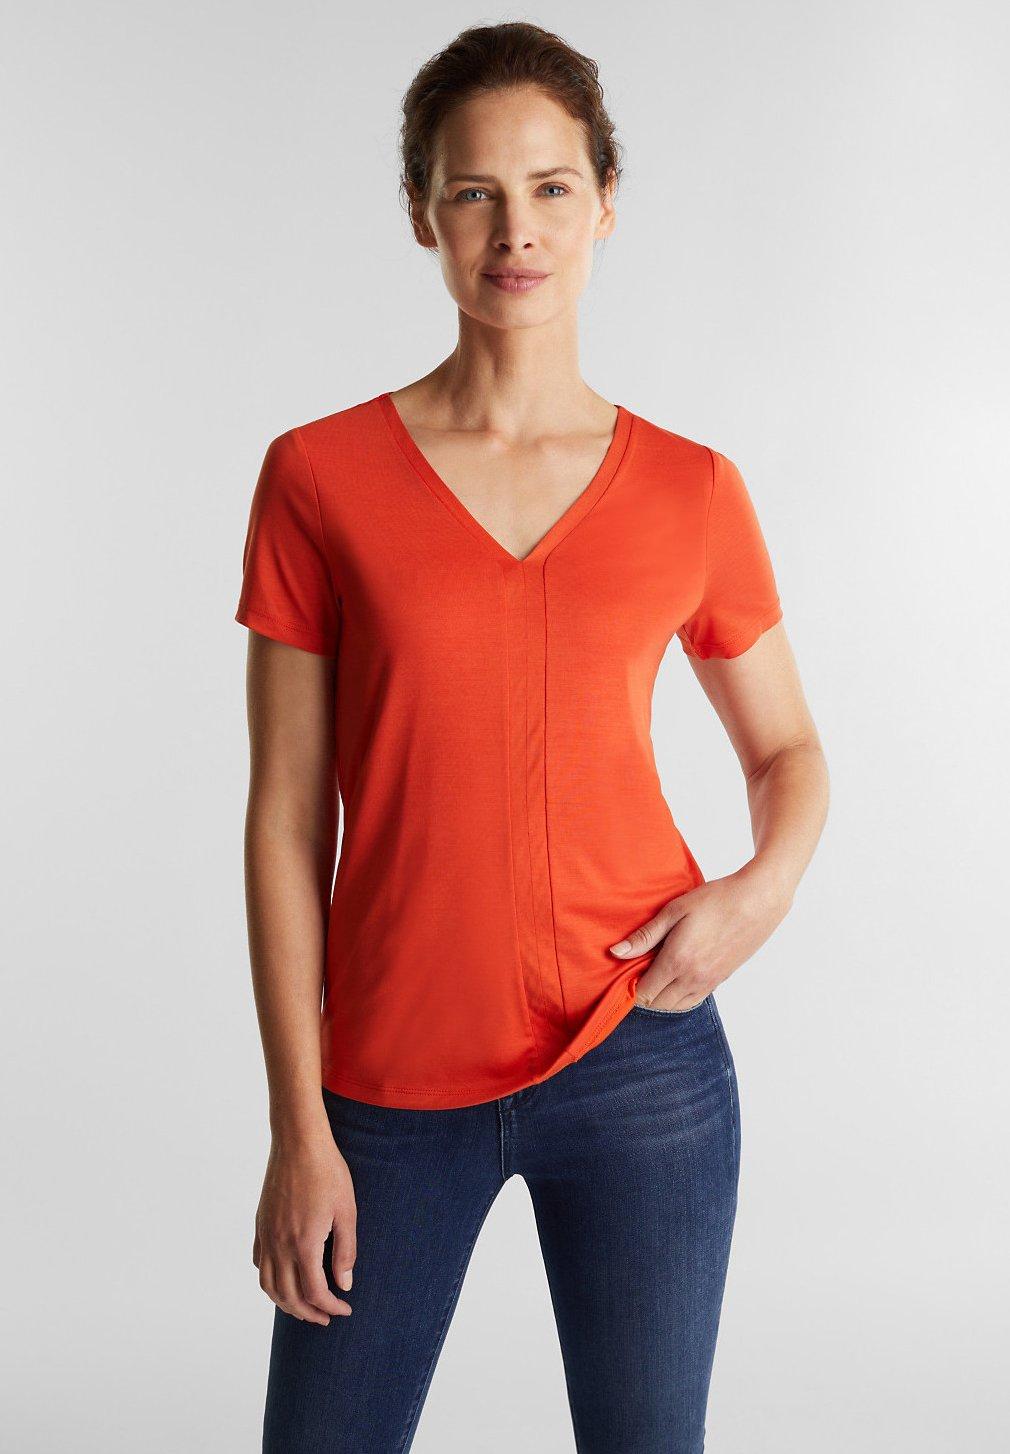 Esprit Collection T-shirt basique - rust orange - Tops & T-shirts Femme A0Og9